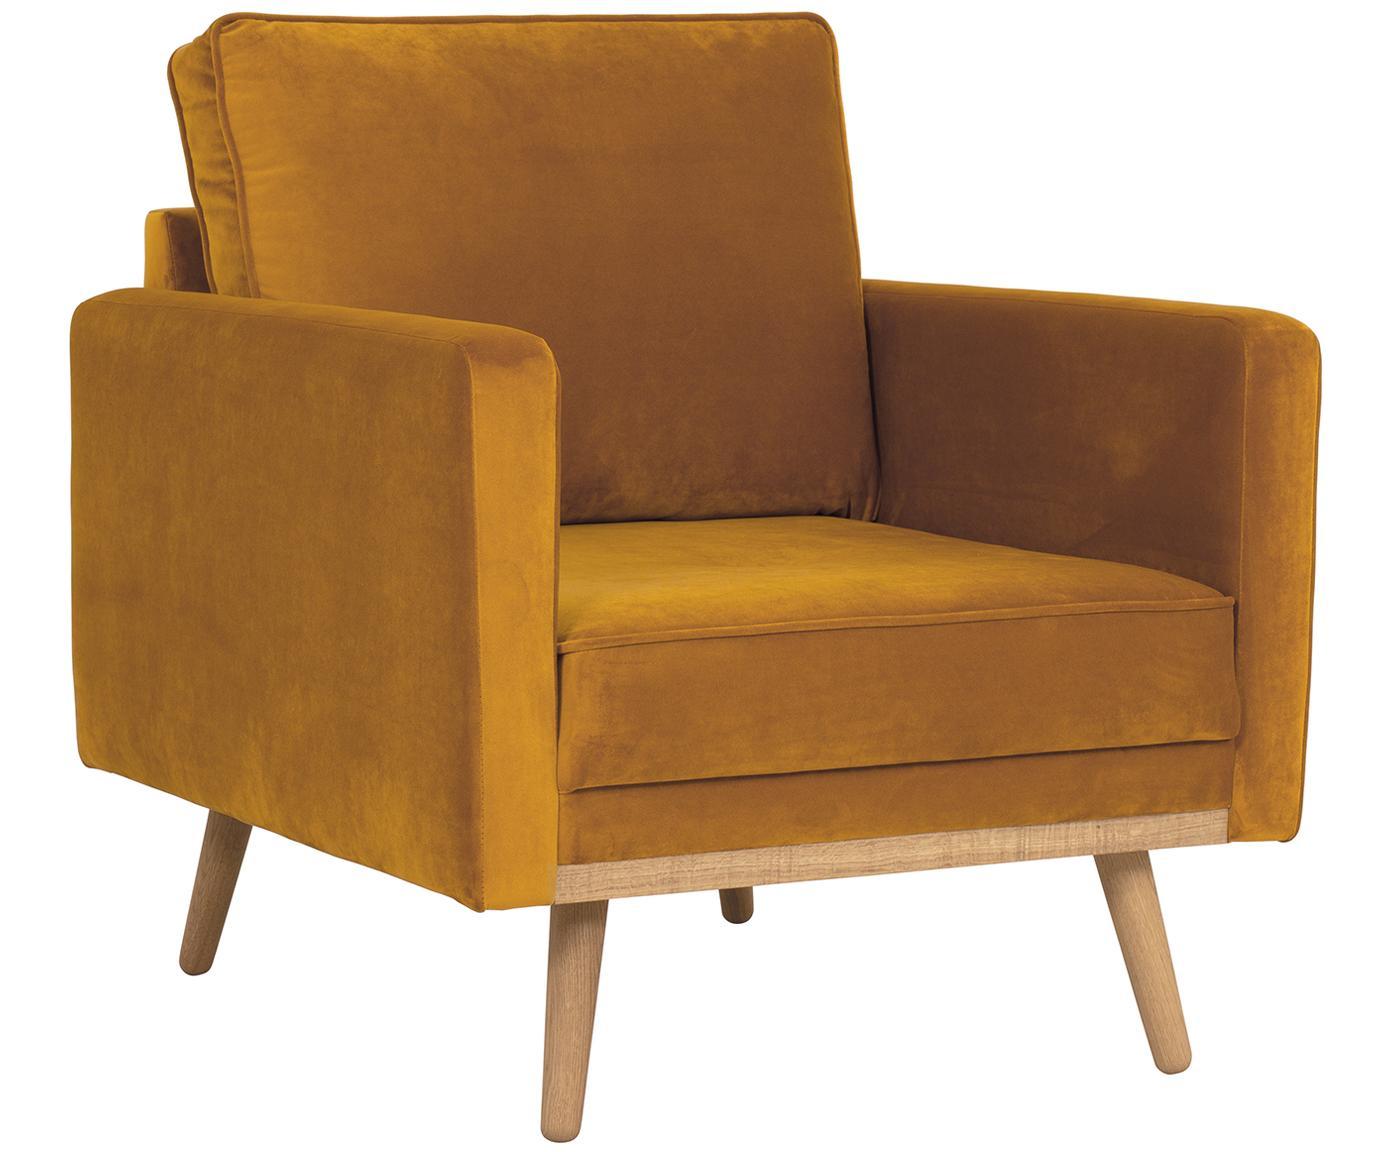 Fluwelen fauteuil Saint, Bekleding: fluweel (polyester), Frame: massief grenenhout, spaan, Bekleding: okergeel. Poten en frame: eikenhoutkleurig, B 85 x D 76 cm